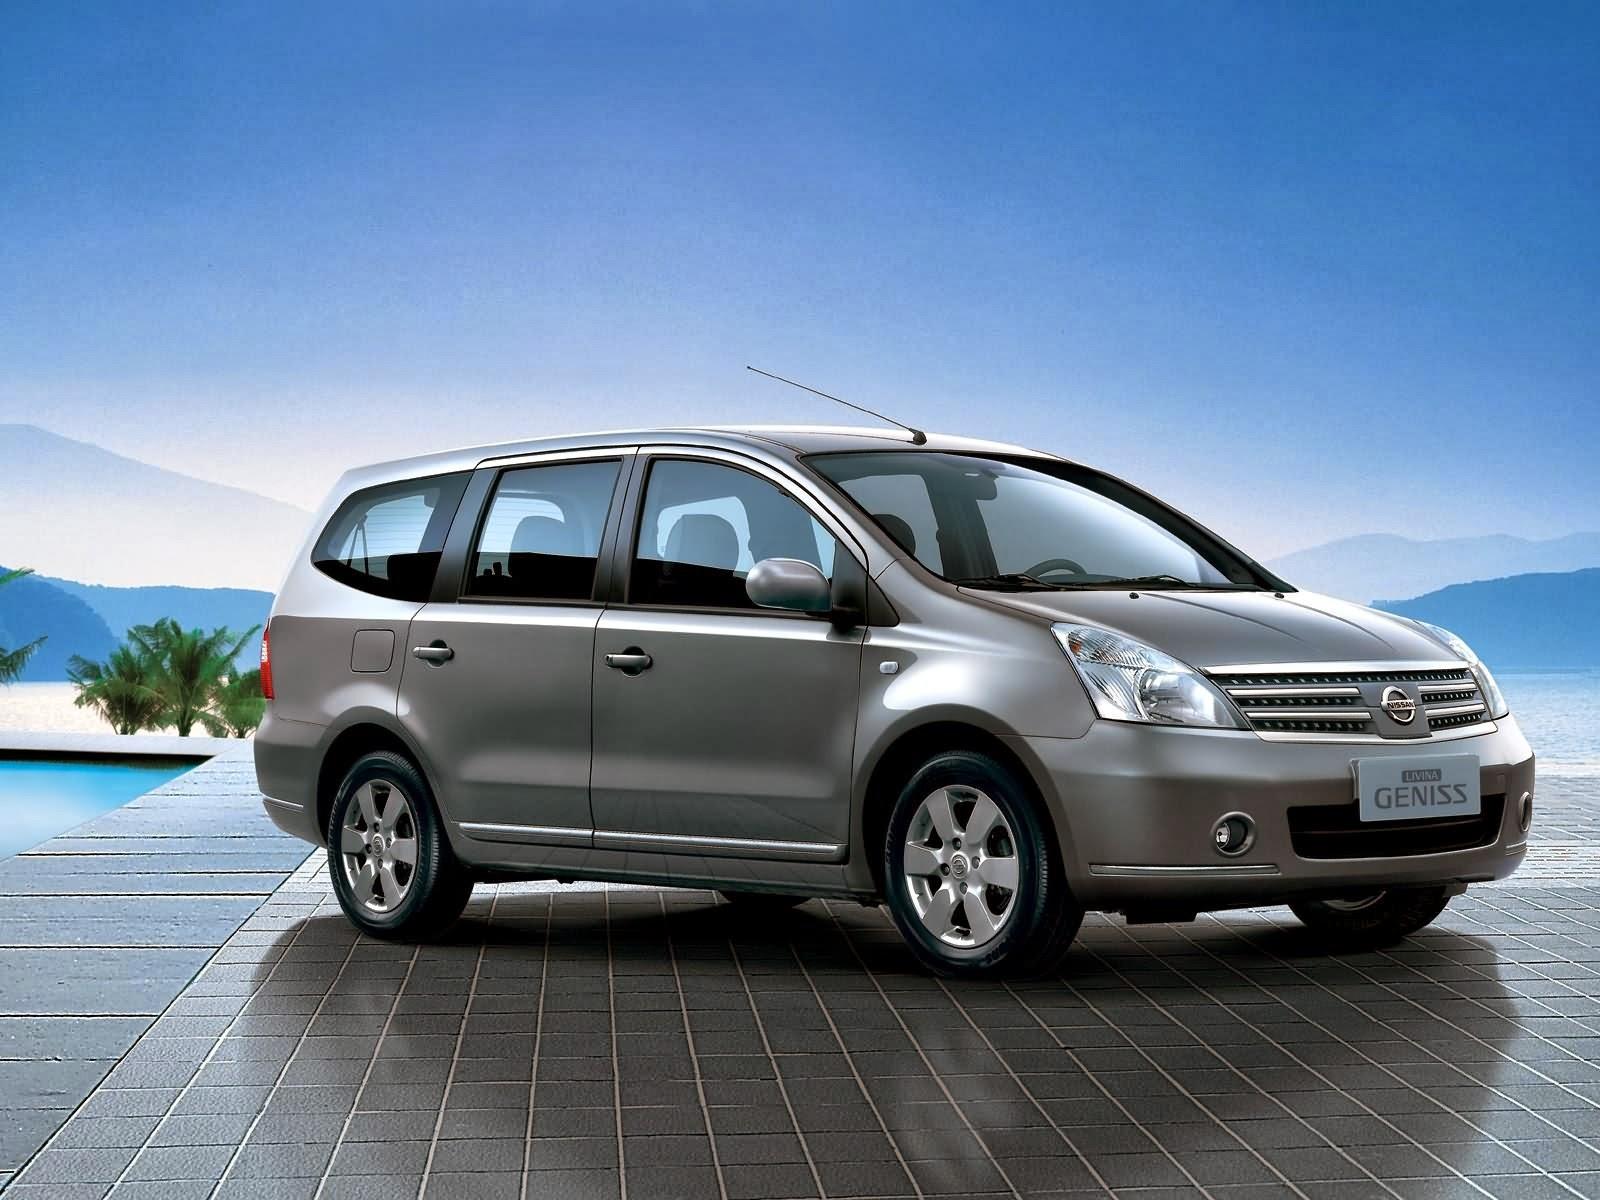 Nissan Livina Geniss Exterior Images